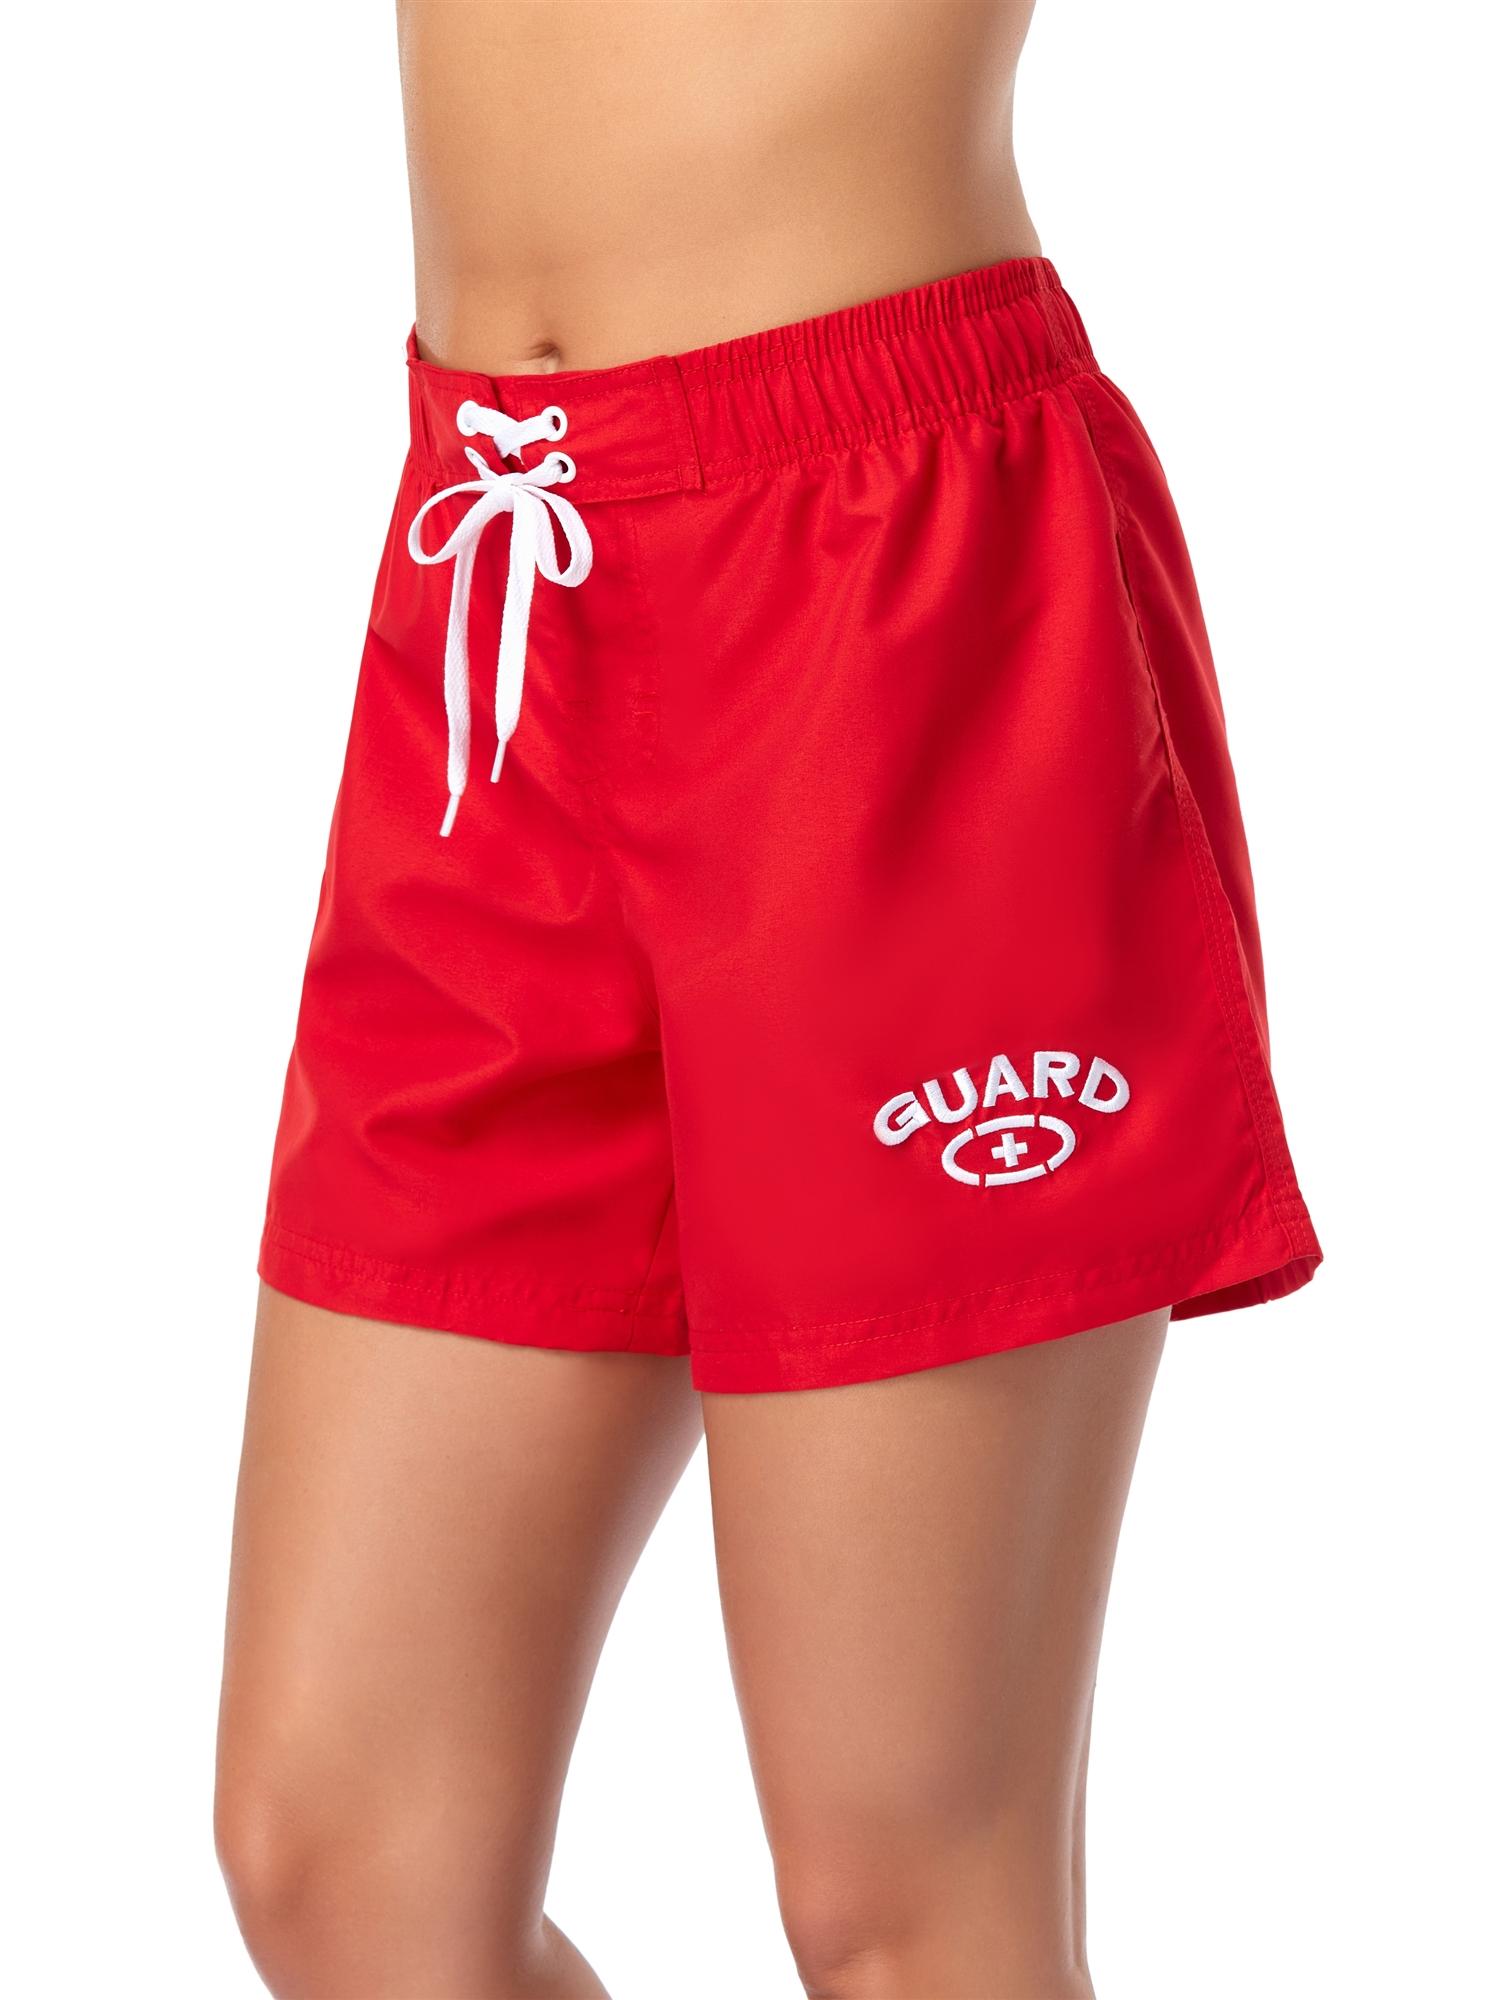 1882c5e4f5 Adoretex Women's Guard Board Short Swimwear Larger Photo ...